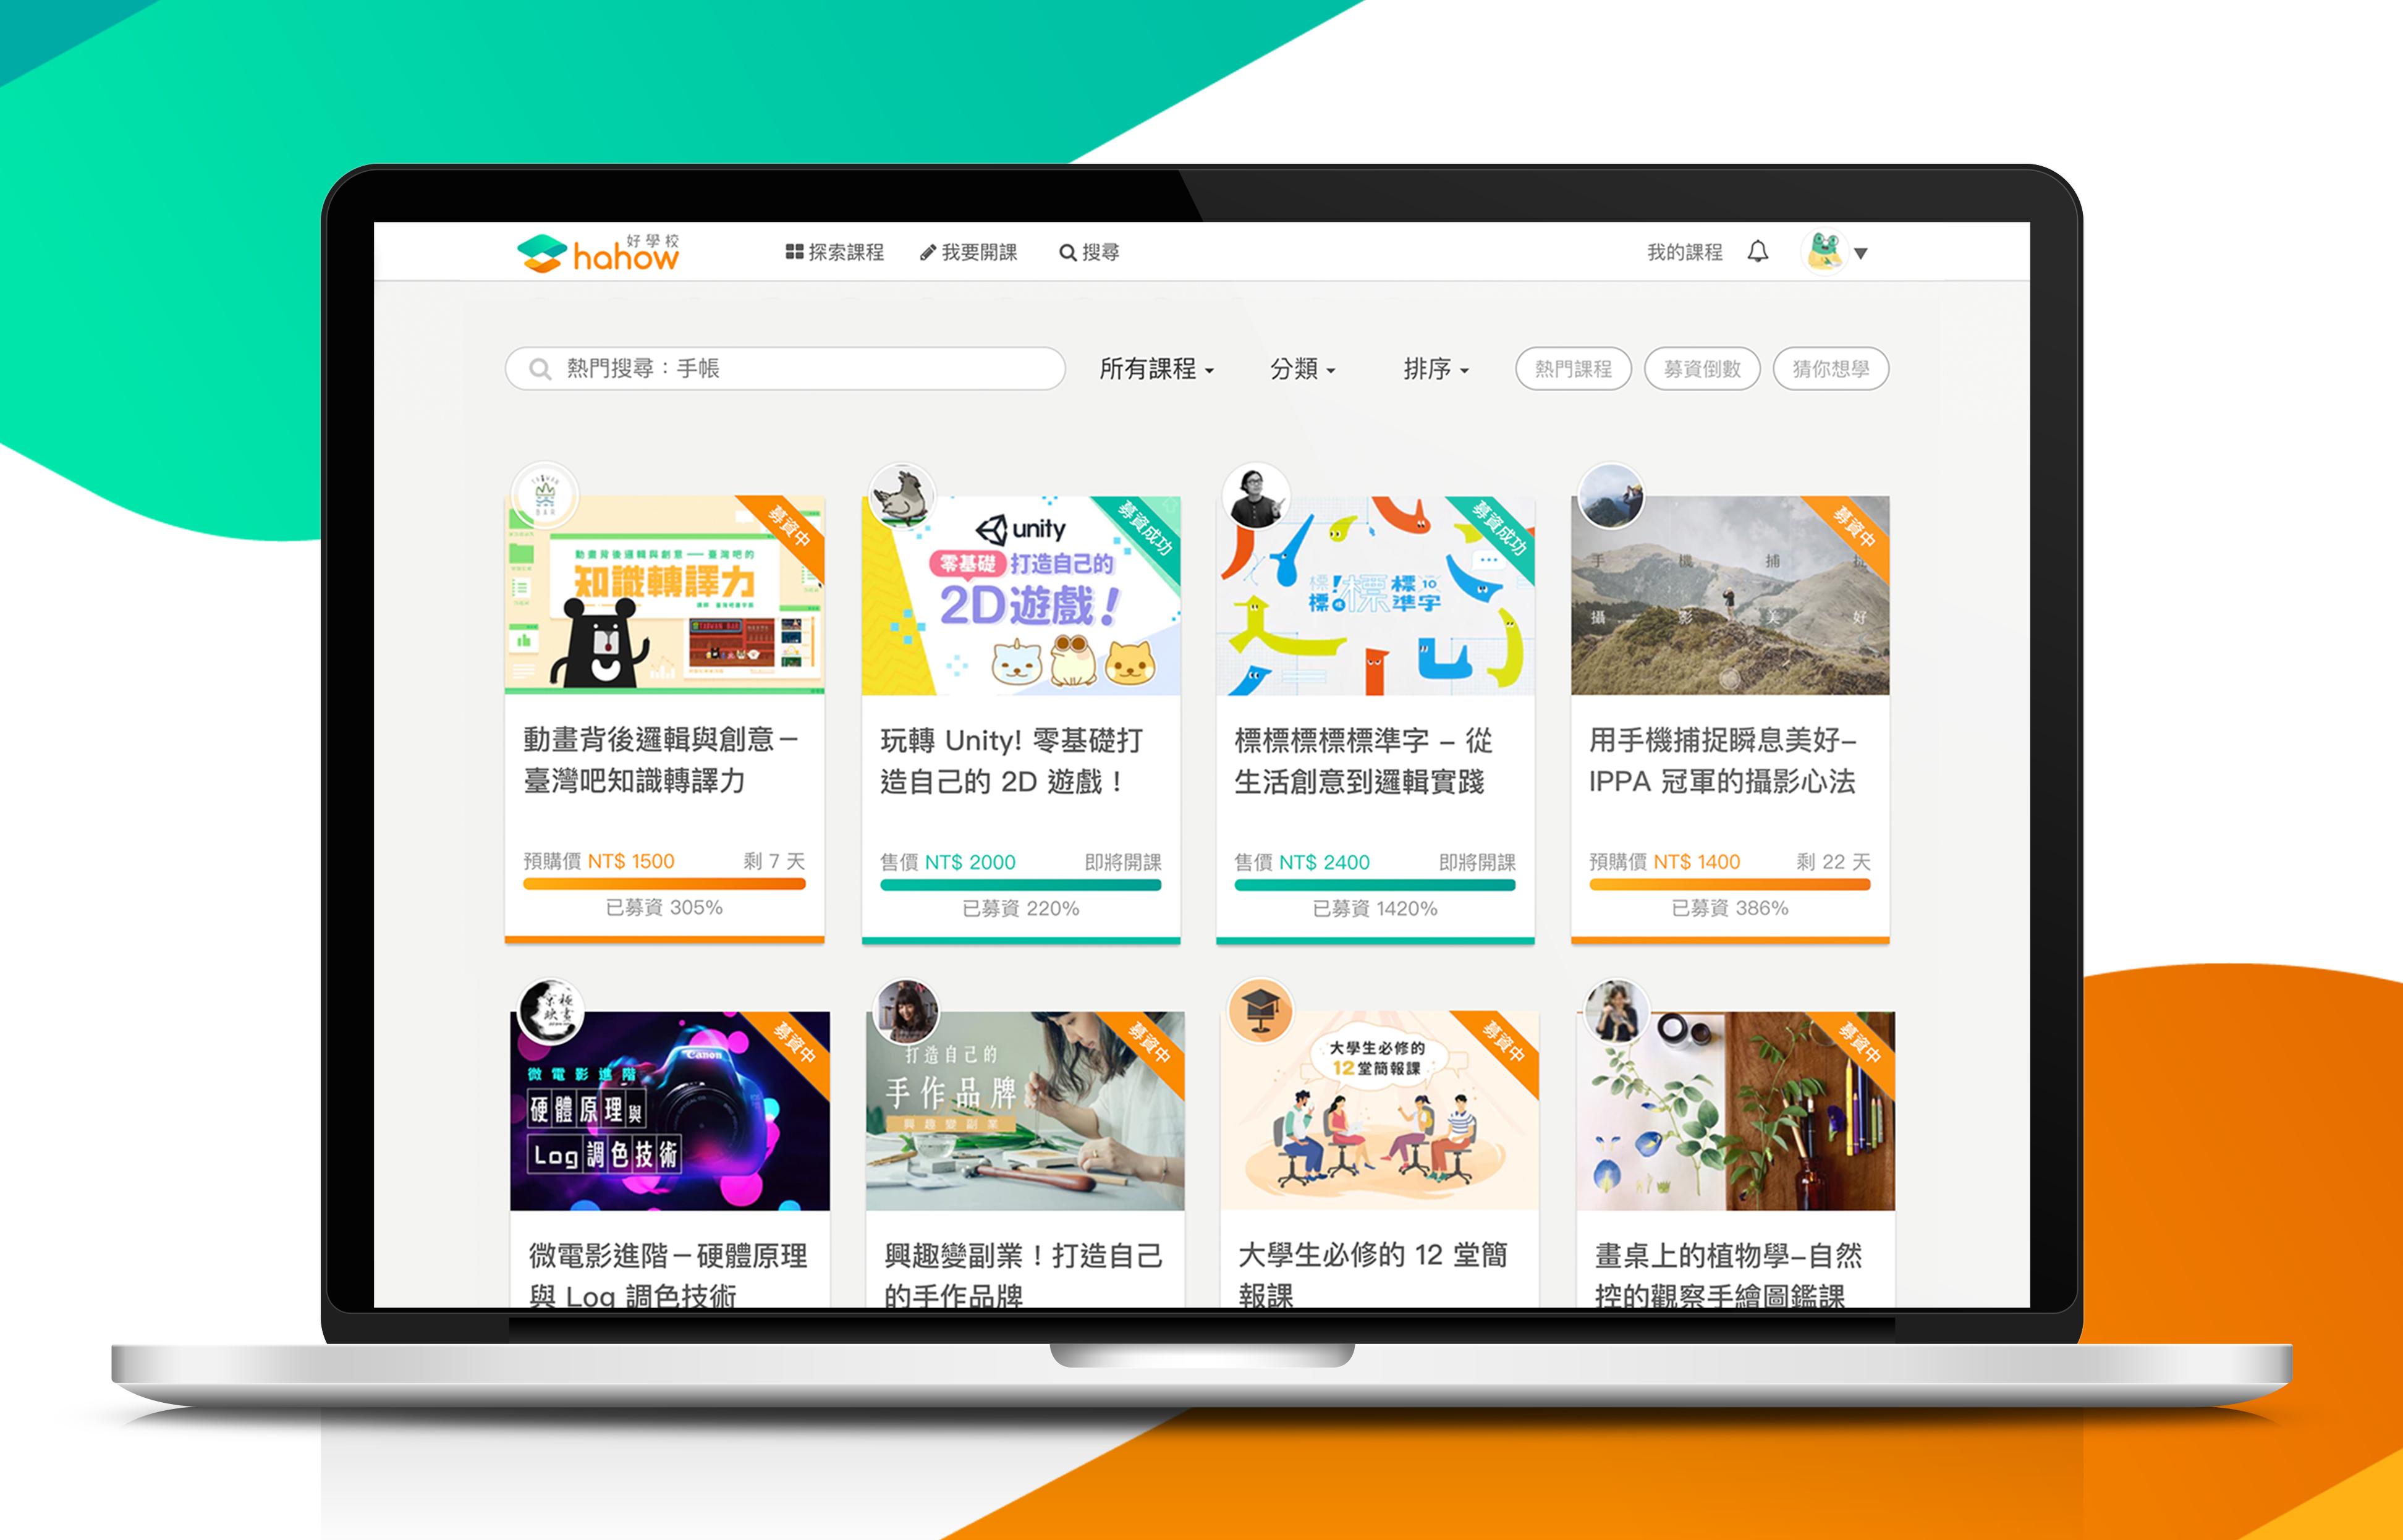 「Hahow 好學校」平台上有各式各樣的有趣課程可供選擇(圖/Hahow)